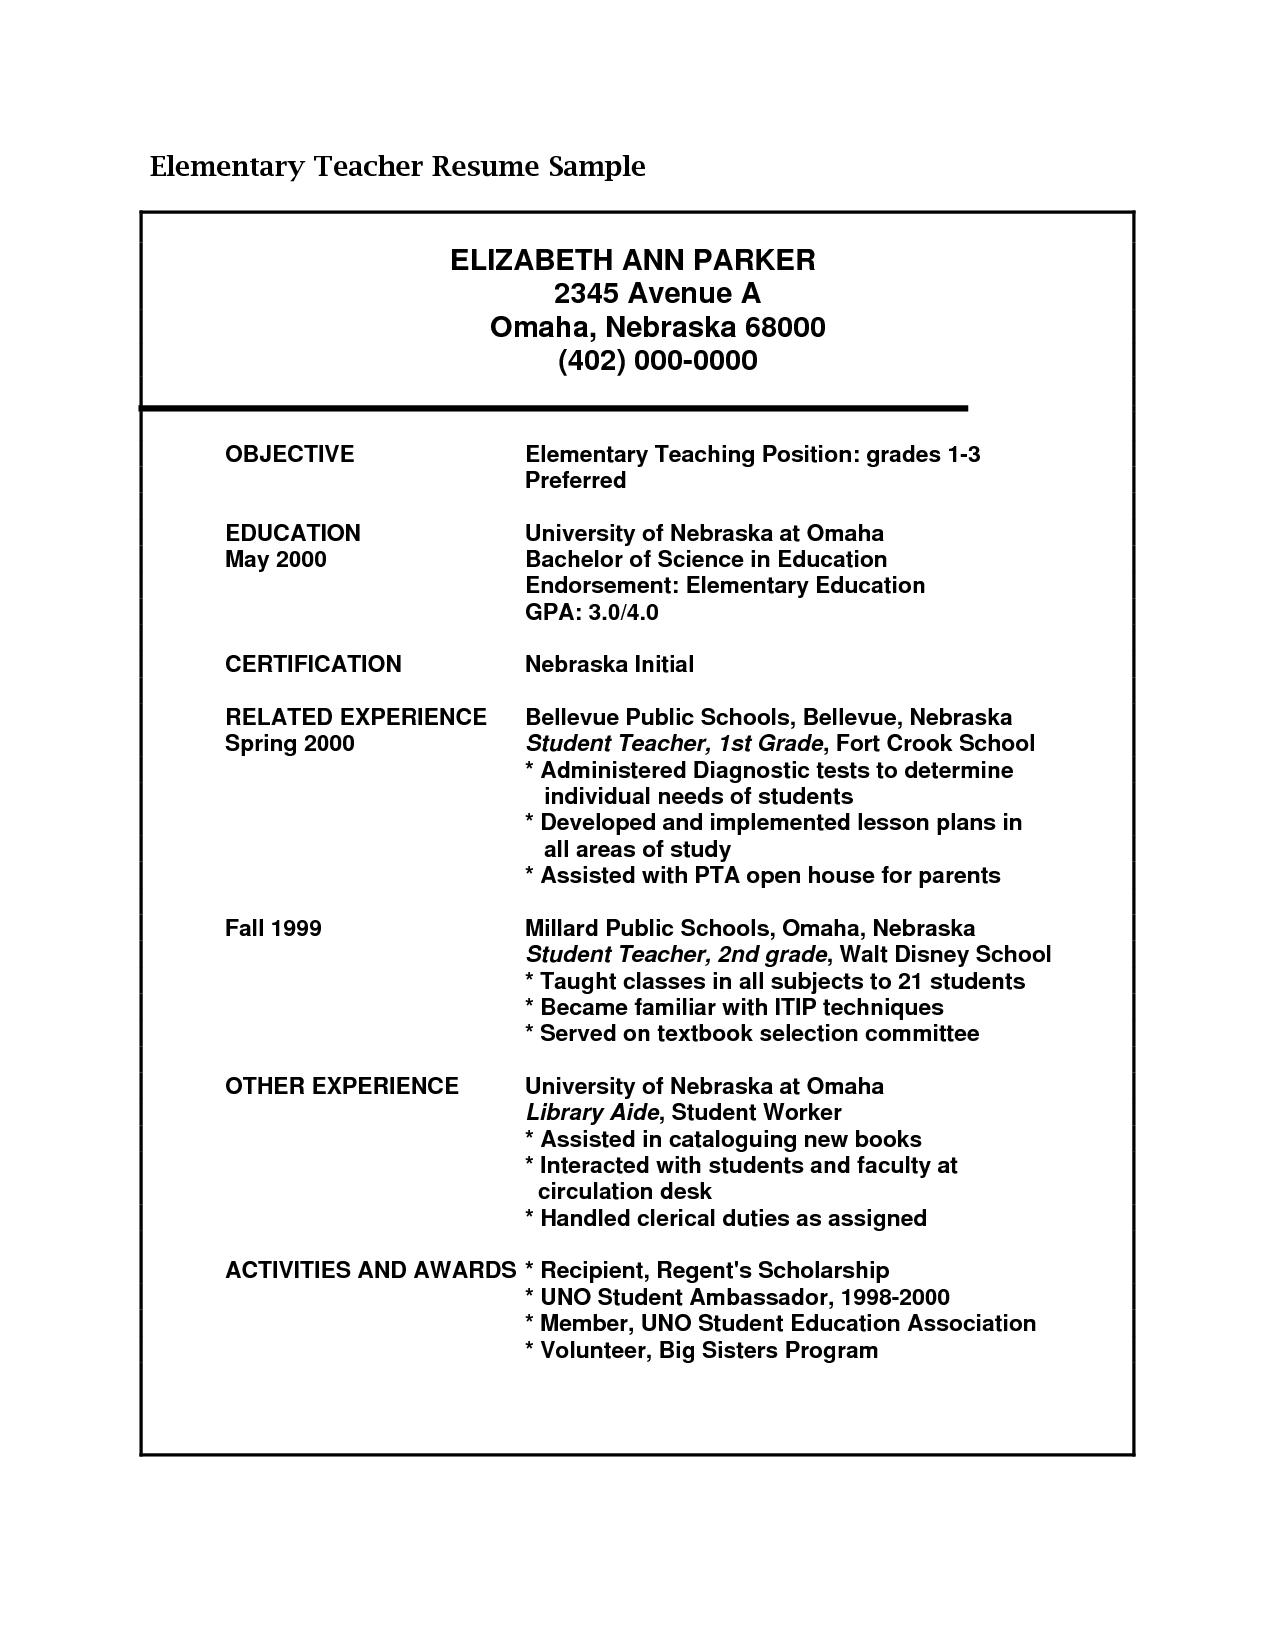 English Teacher Resume Format Download pe example page 1 sample – Teacher Resume Format